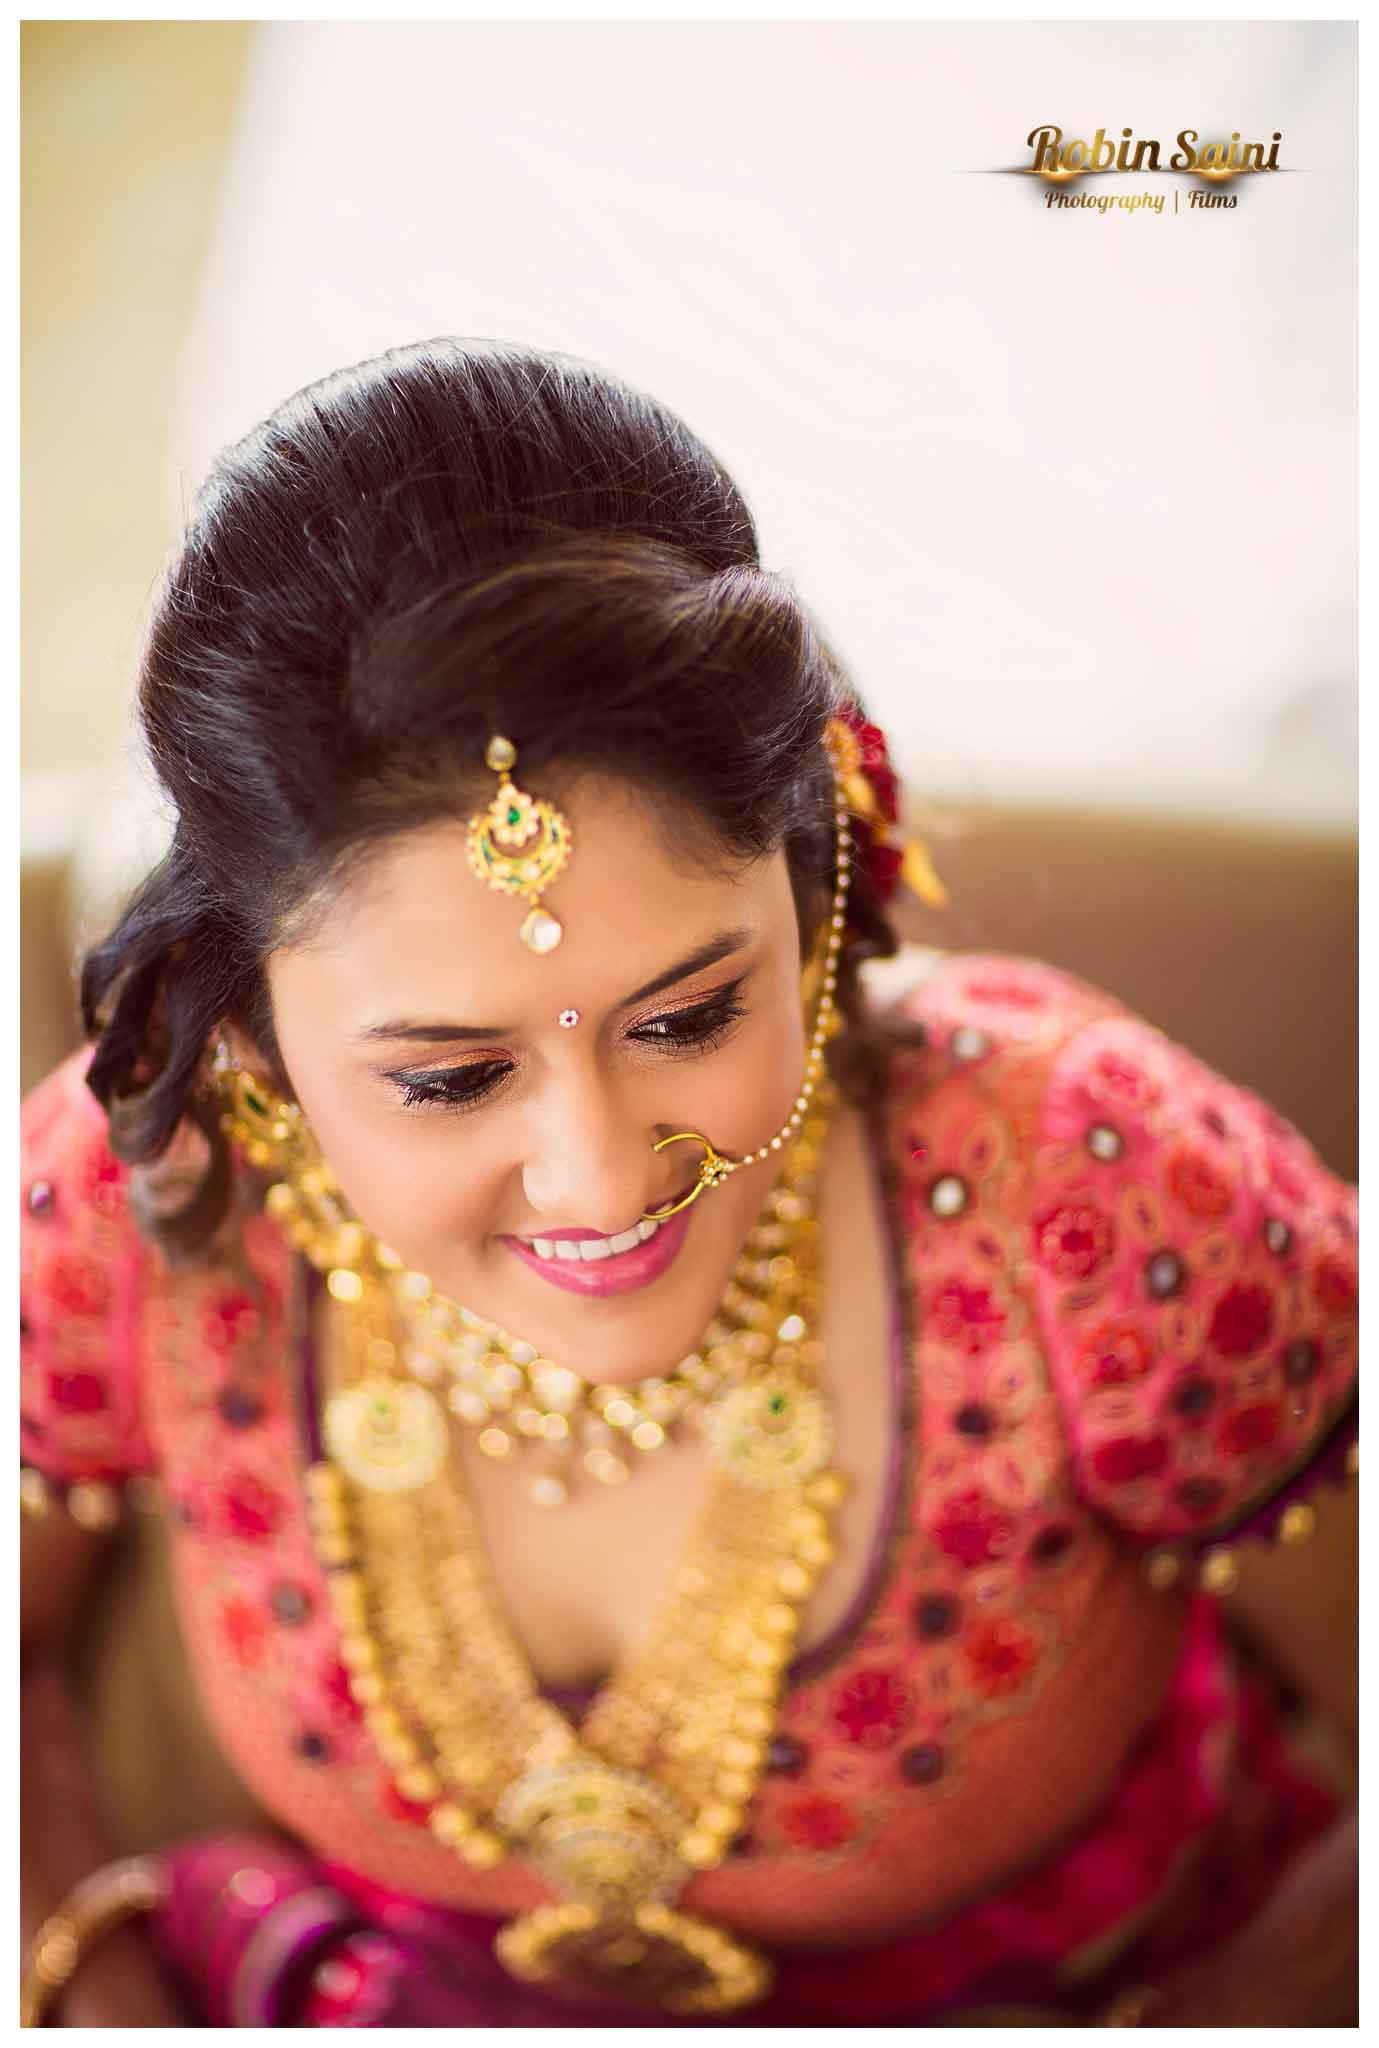 beautiful bridal jewellery:robin saini photography